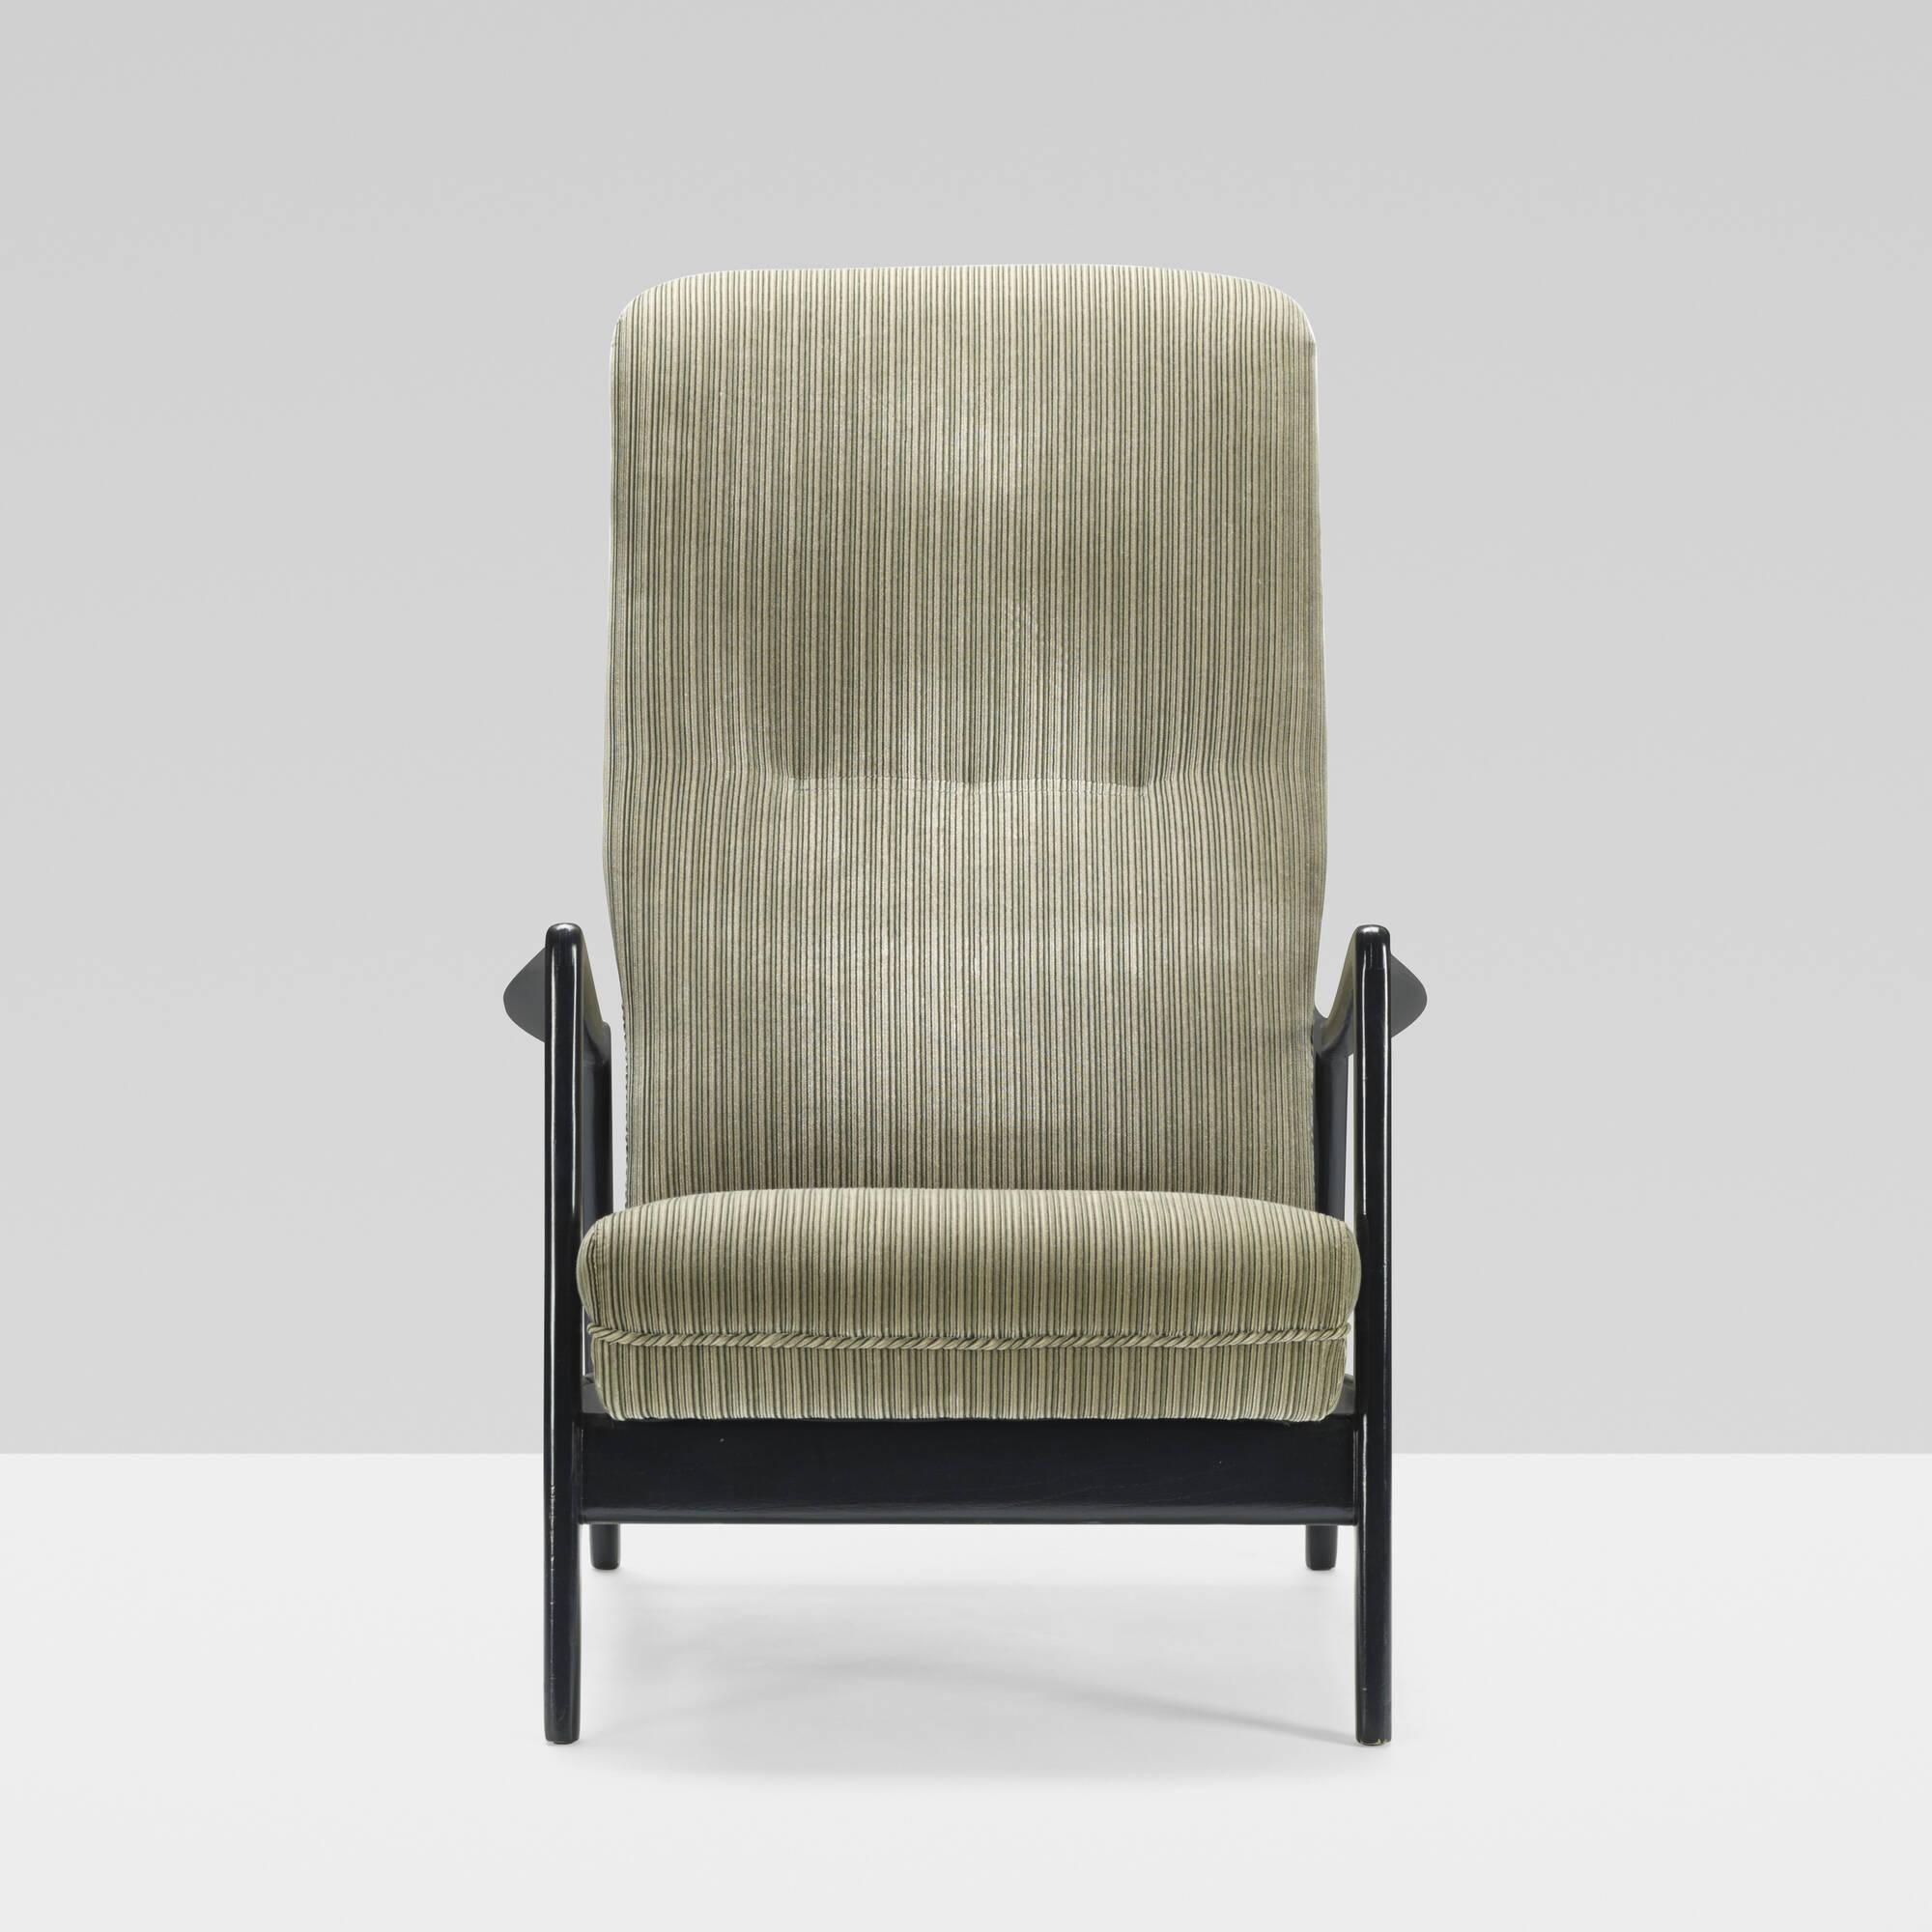 248: Gio Ponti / armchair, model 829 (2 of 3)